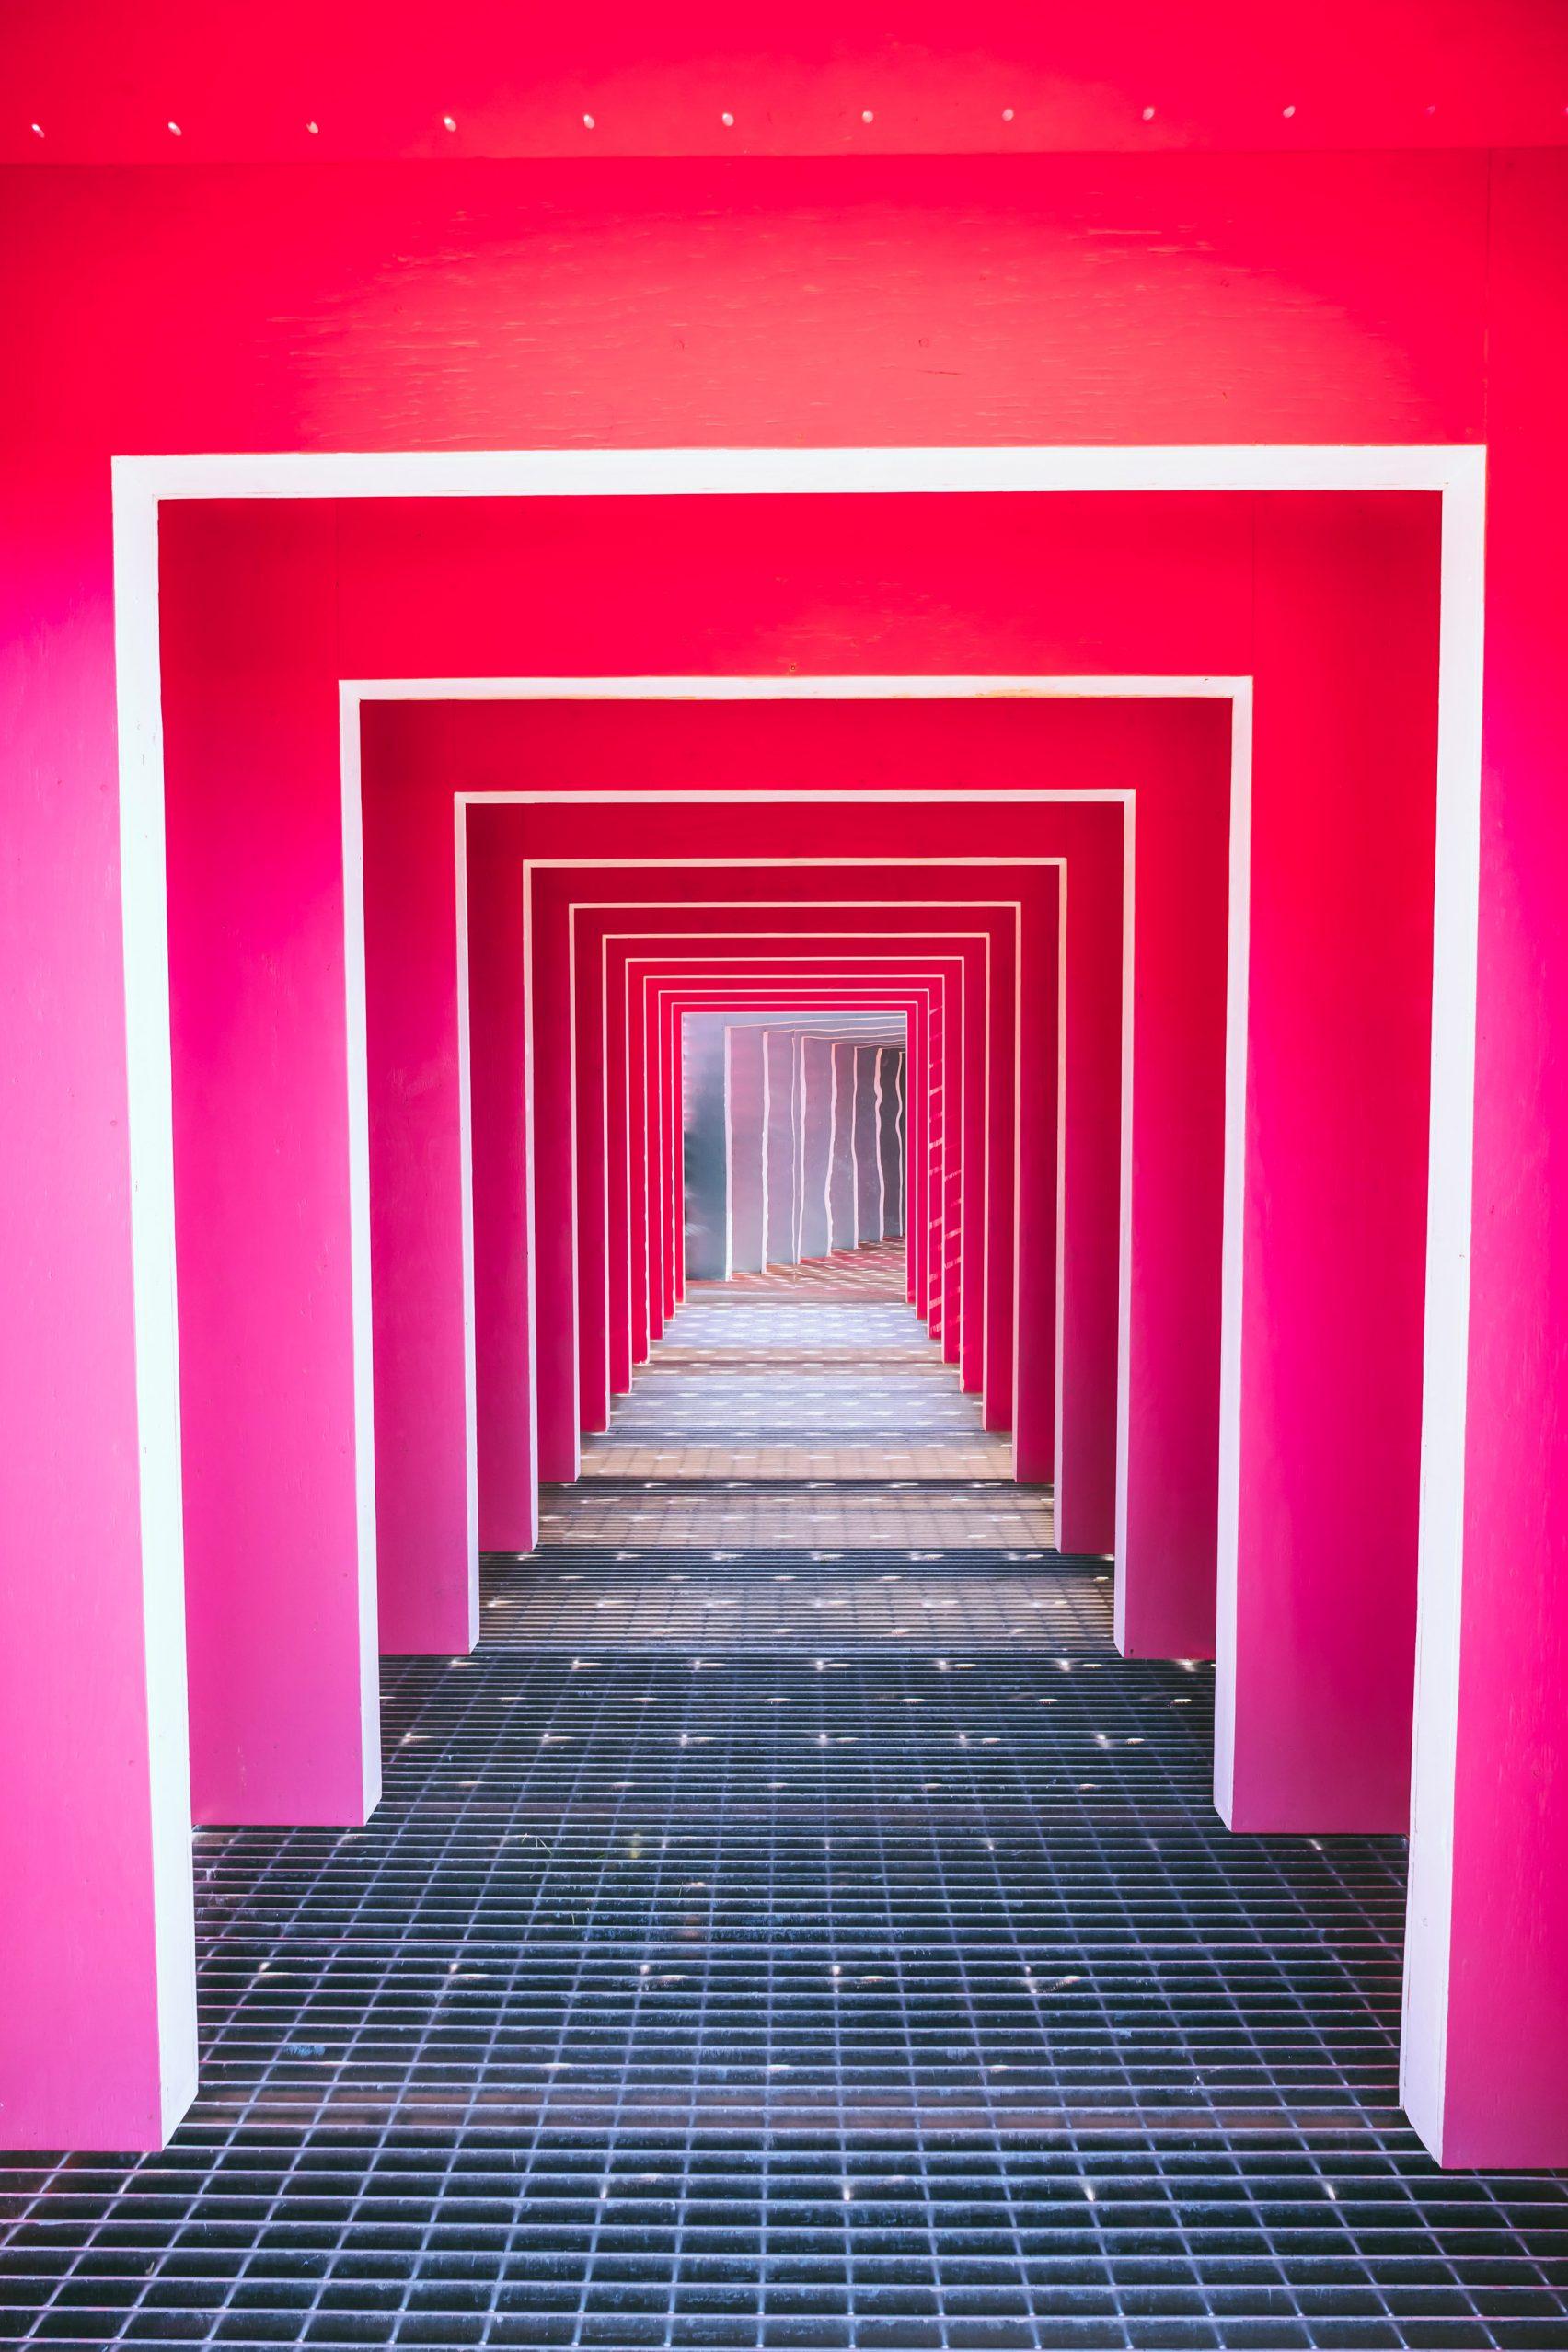 Túnel cor-de-rosa